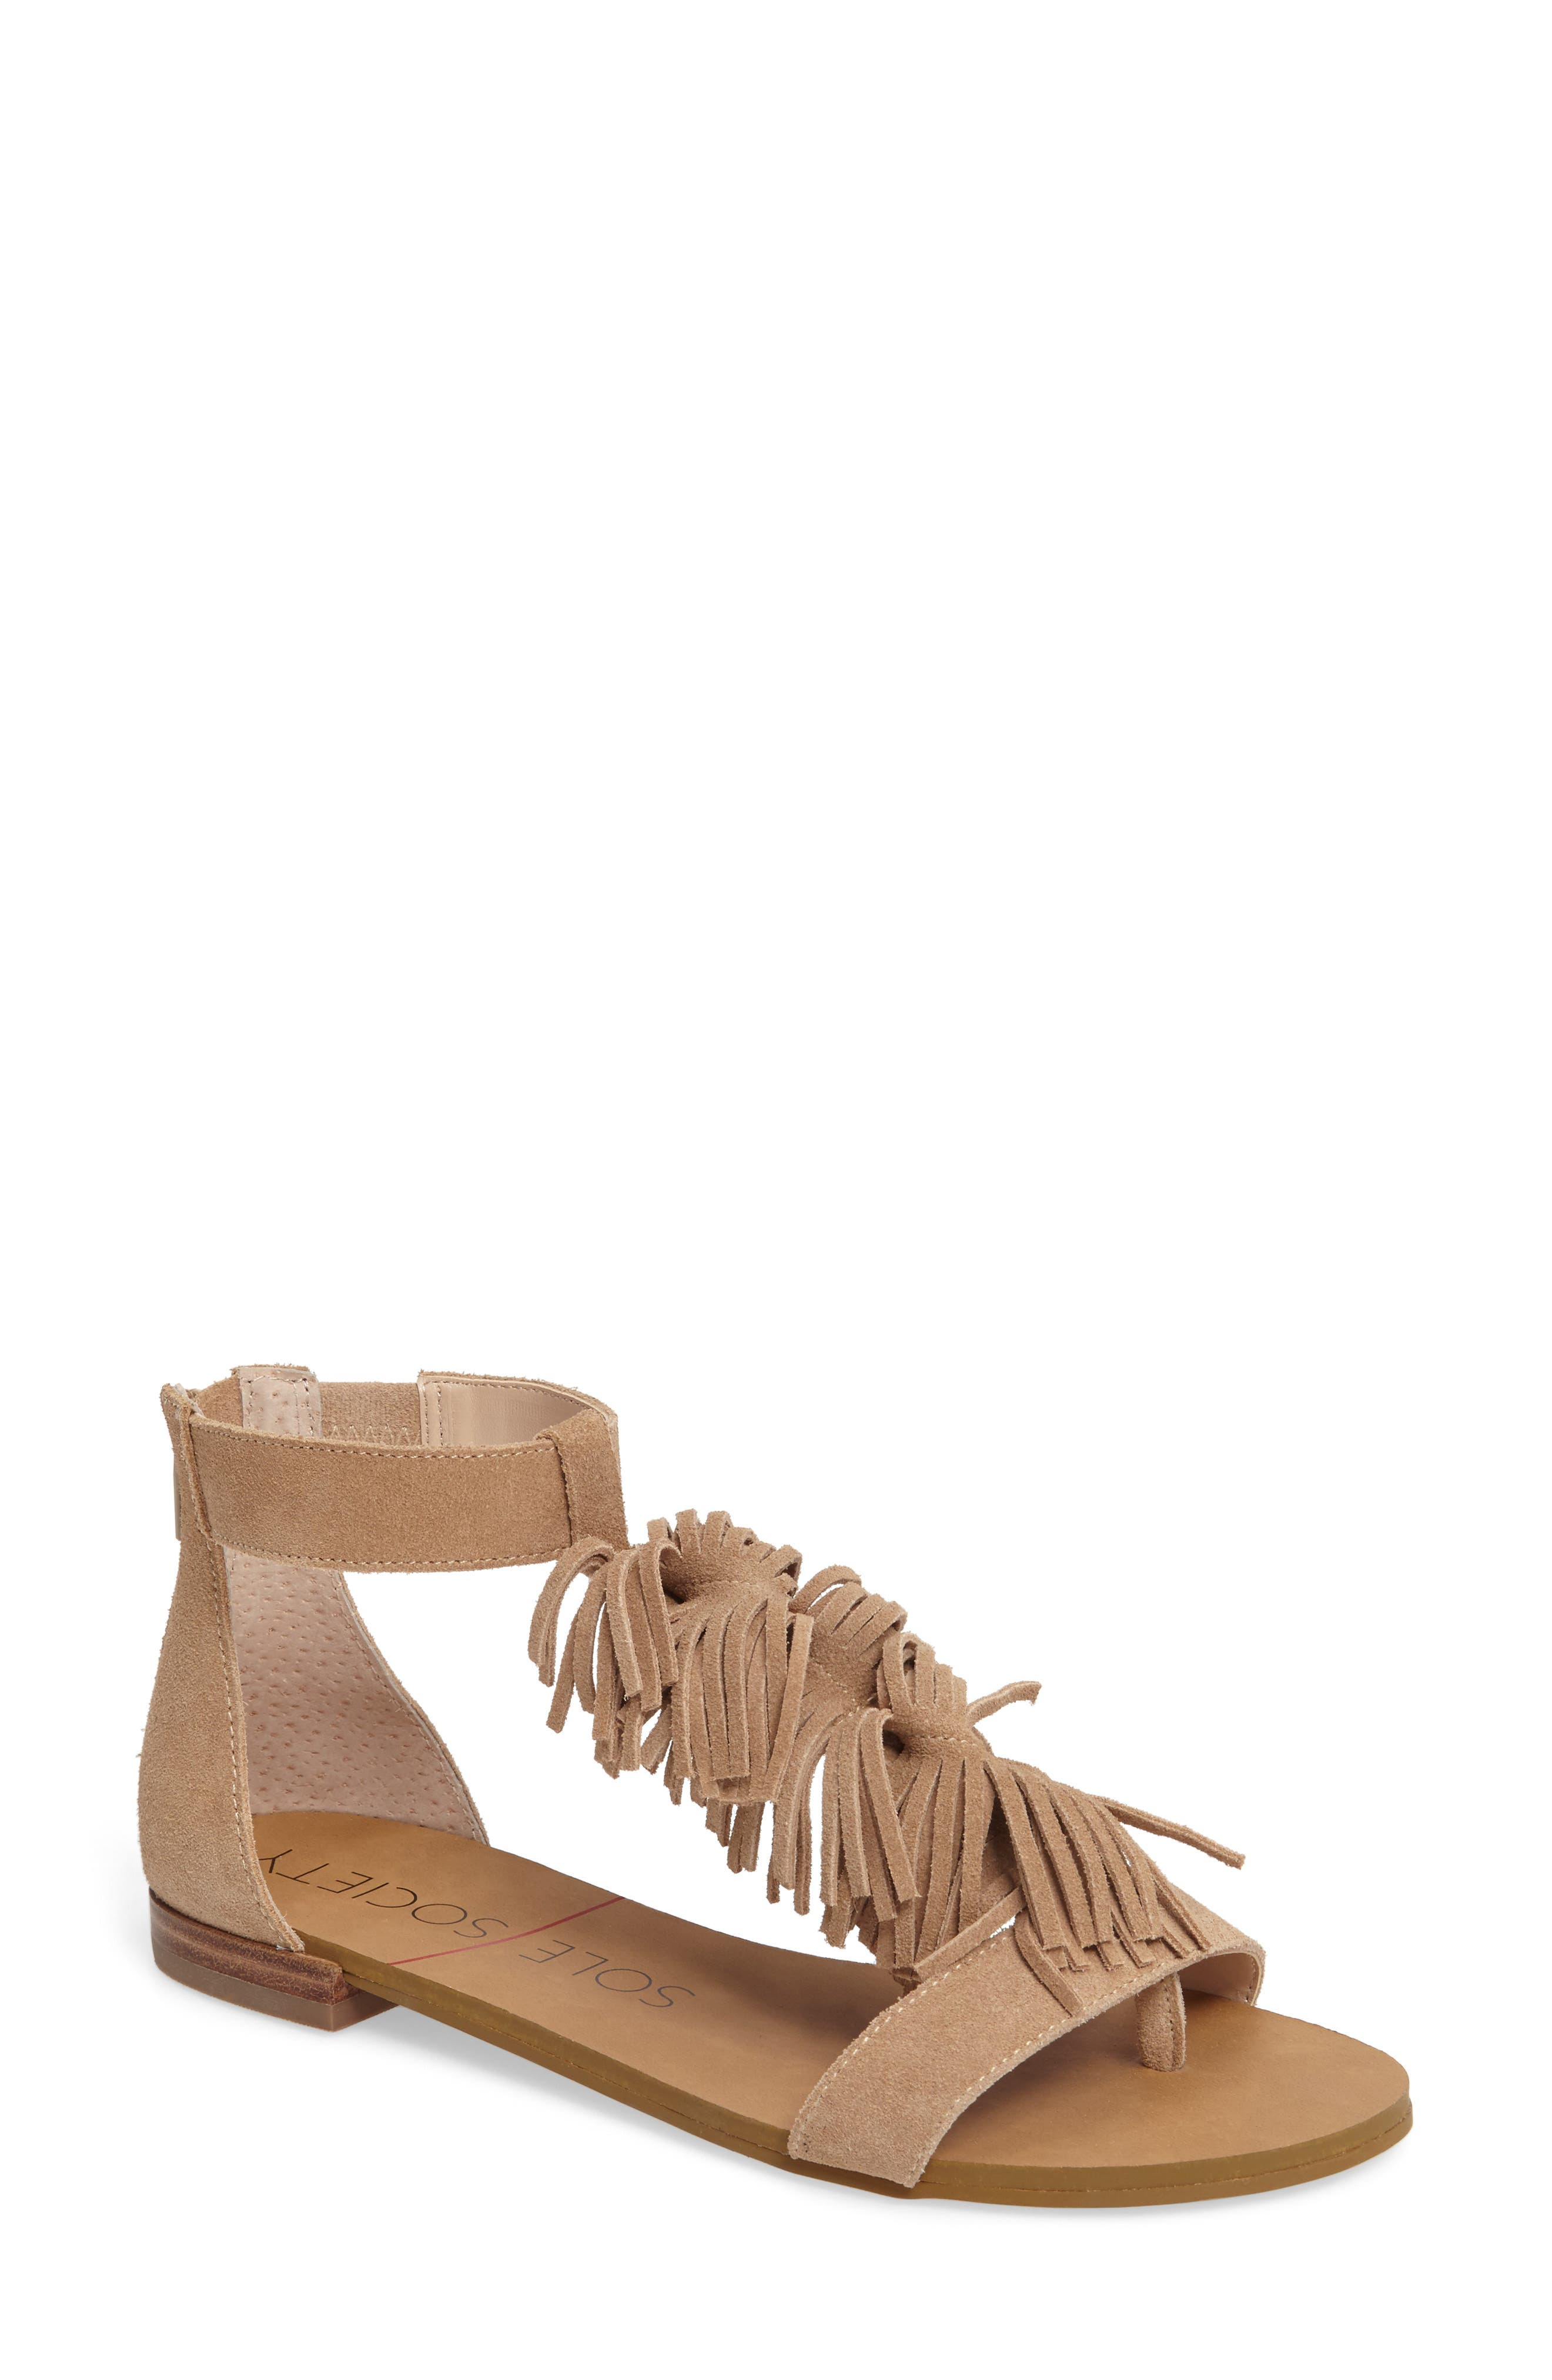 Koa Fringed T-Strap Sandal, Main, color, 200